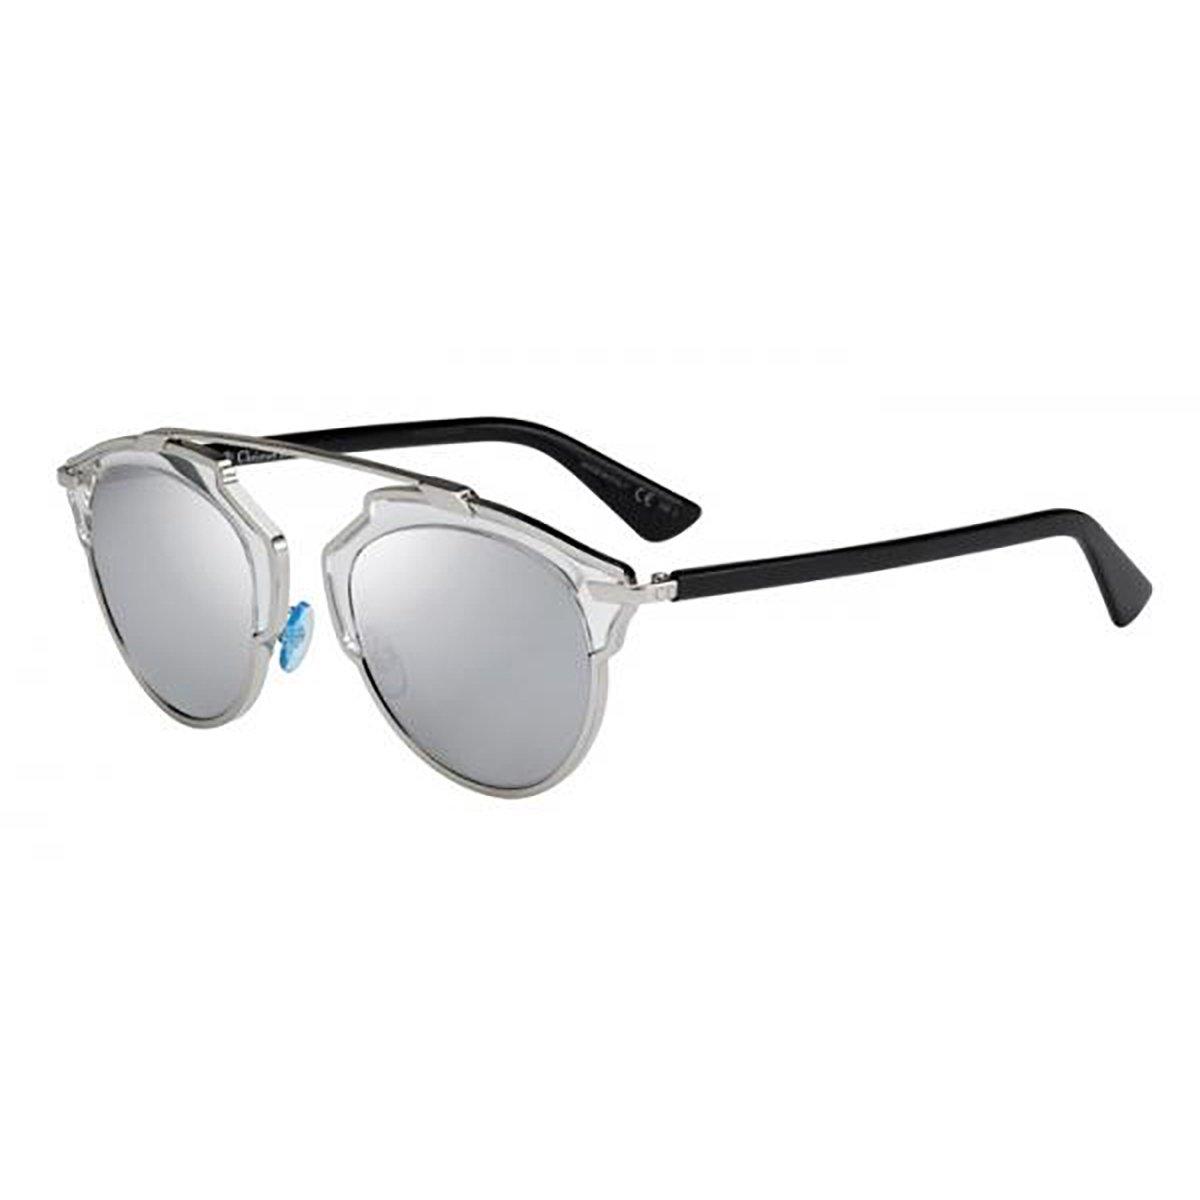 425d5c26664e1 Compre Óculos de Sol Dior Soreal em 10X   Tri-Jóia Shop